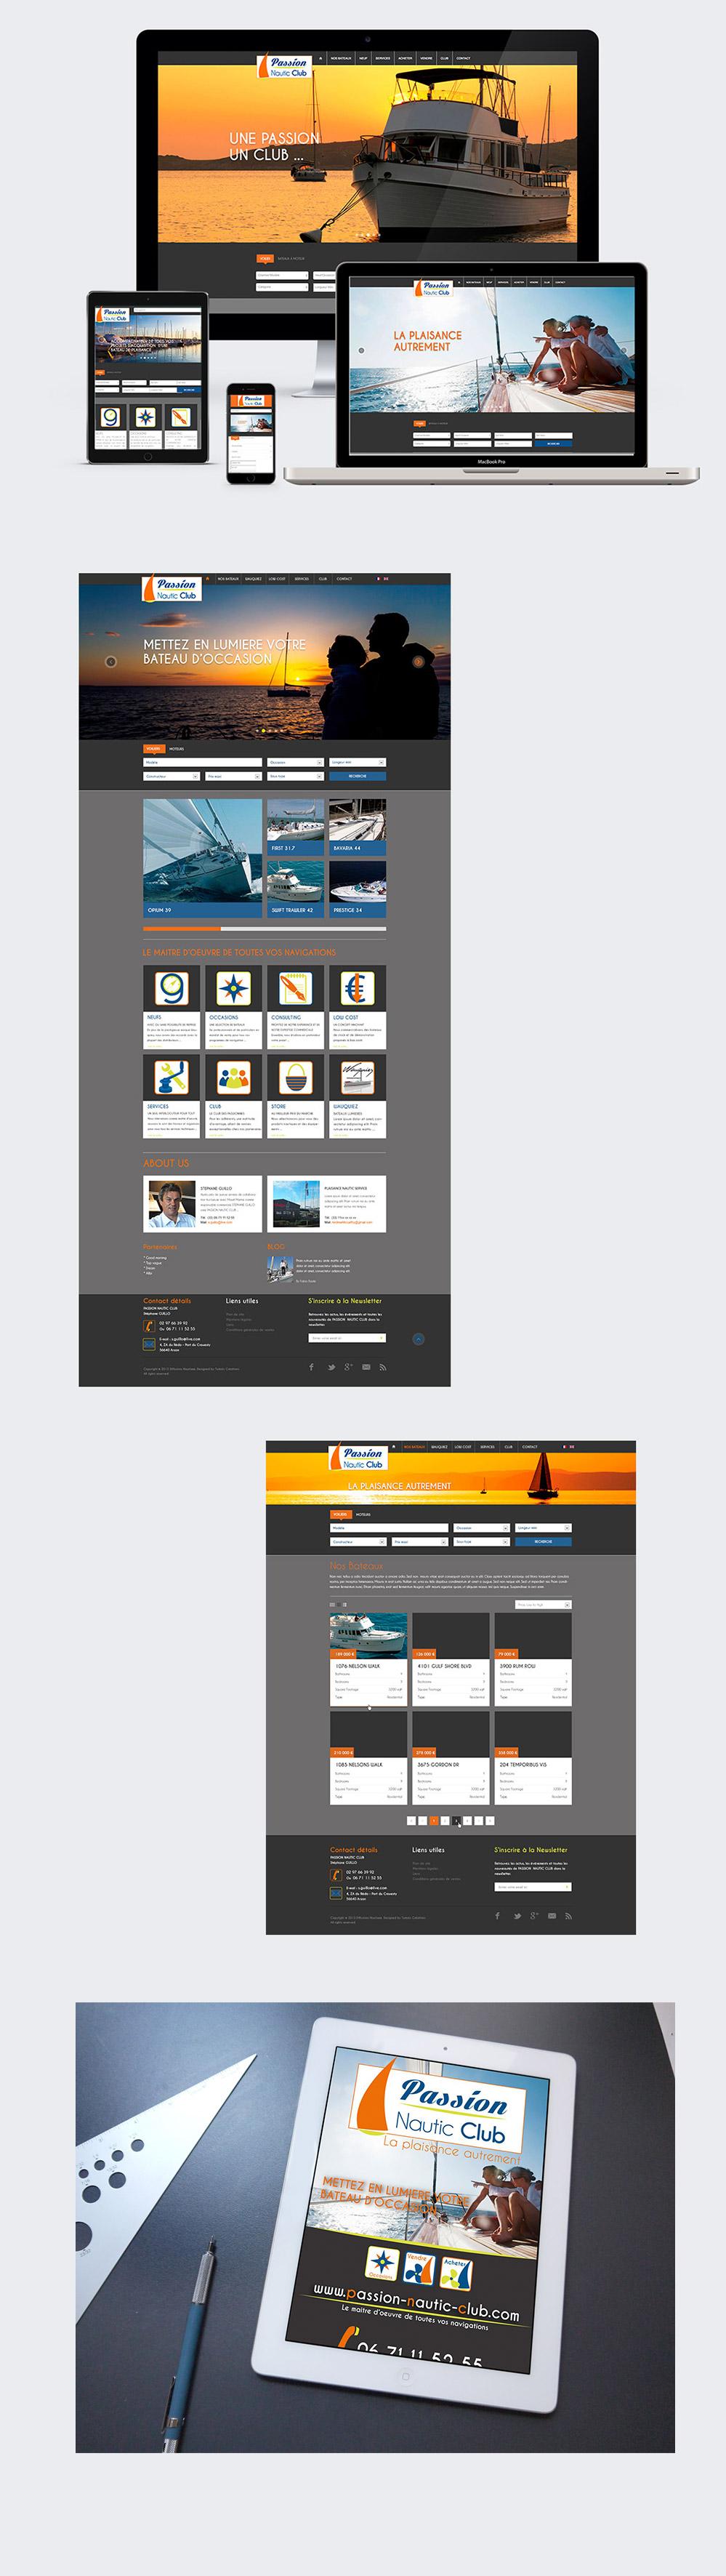 Turkoiz-Creations-Passion-Nautic-Club-Webdesign